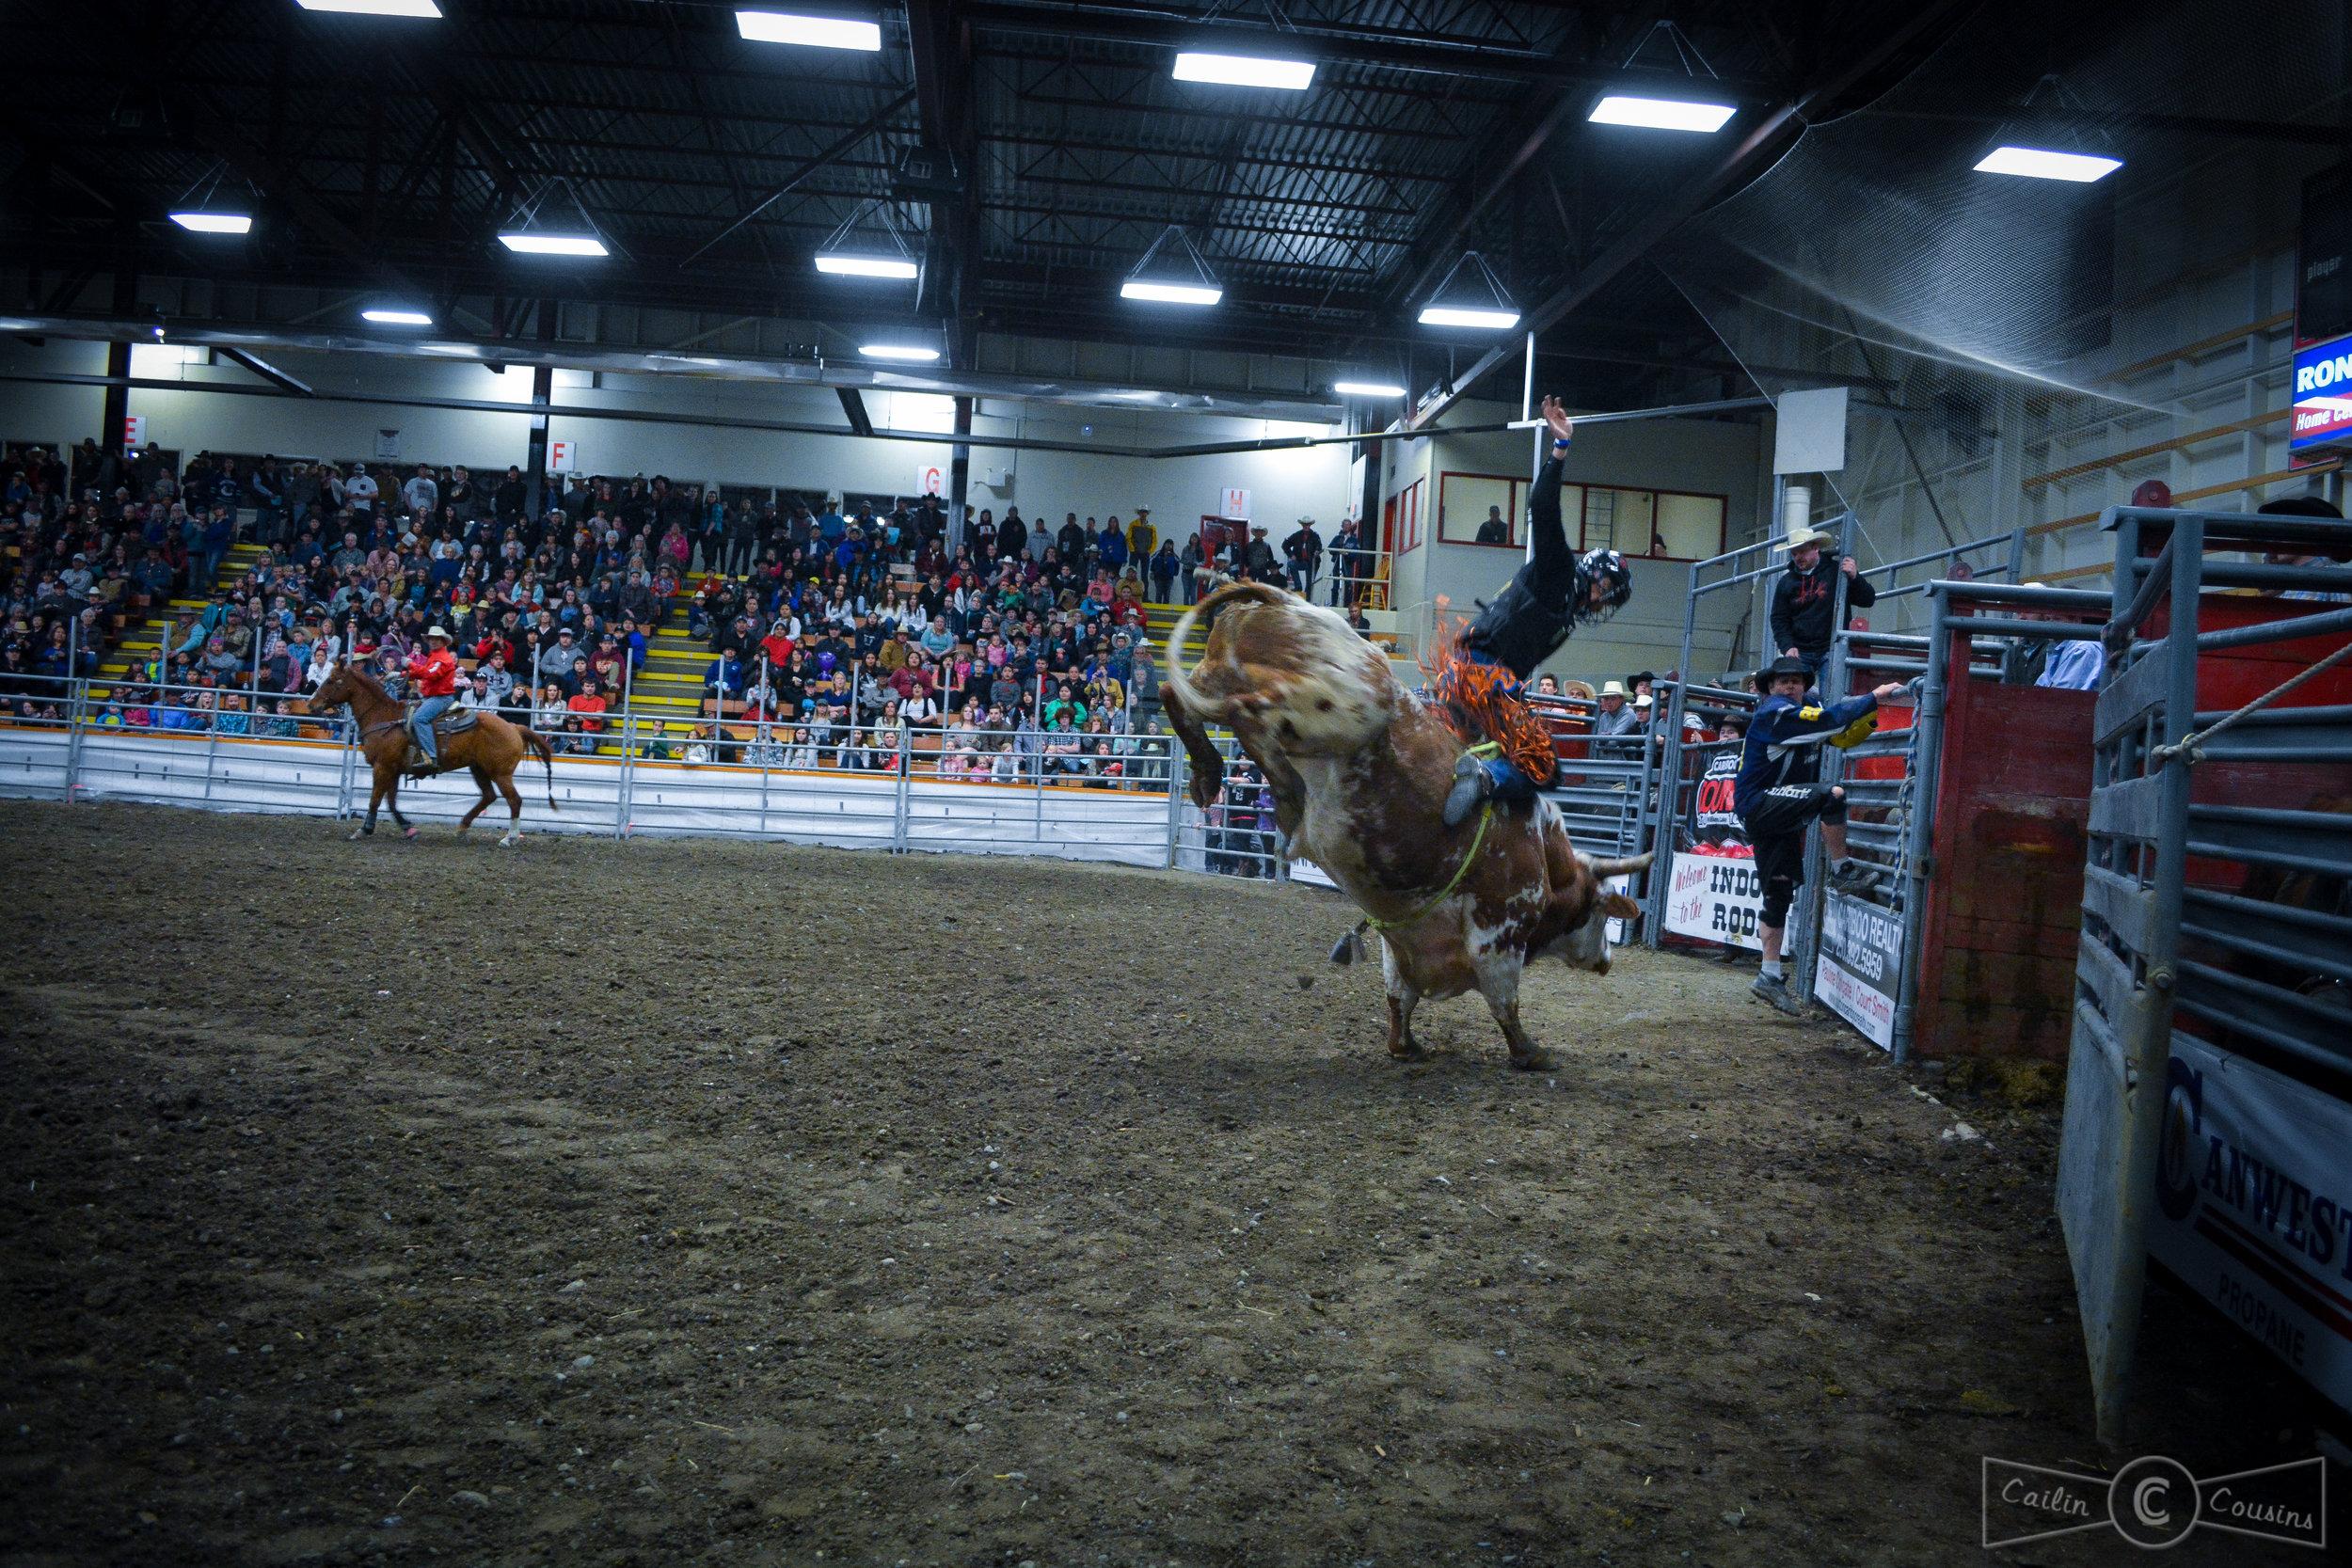 051715_rodeo_cc-4.jpg